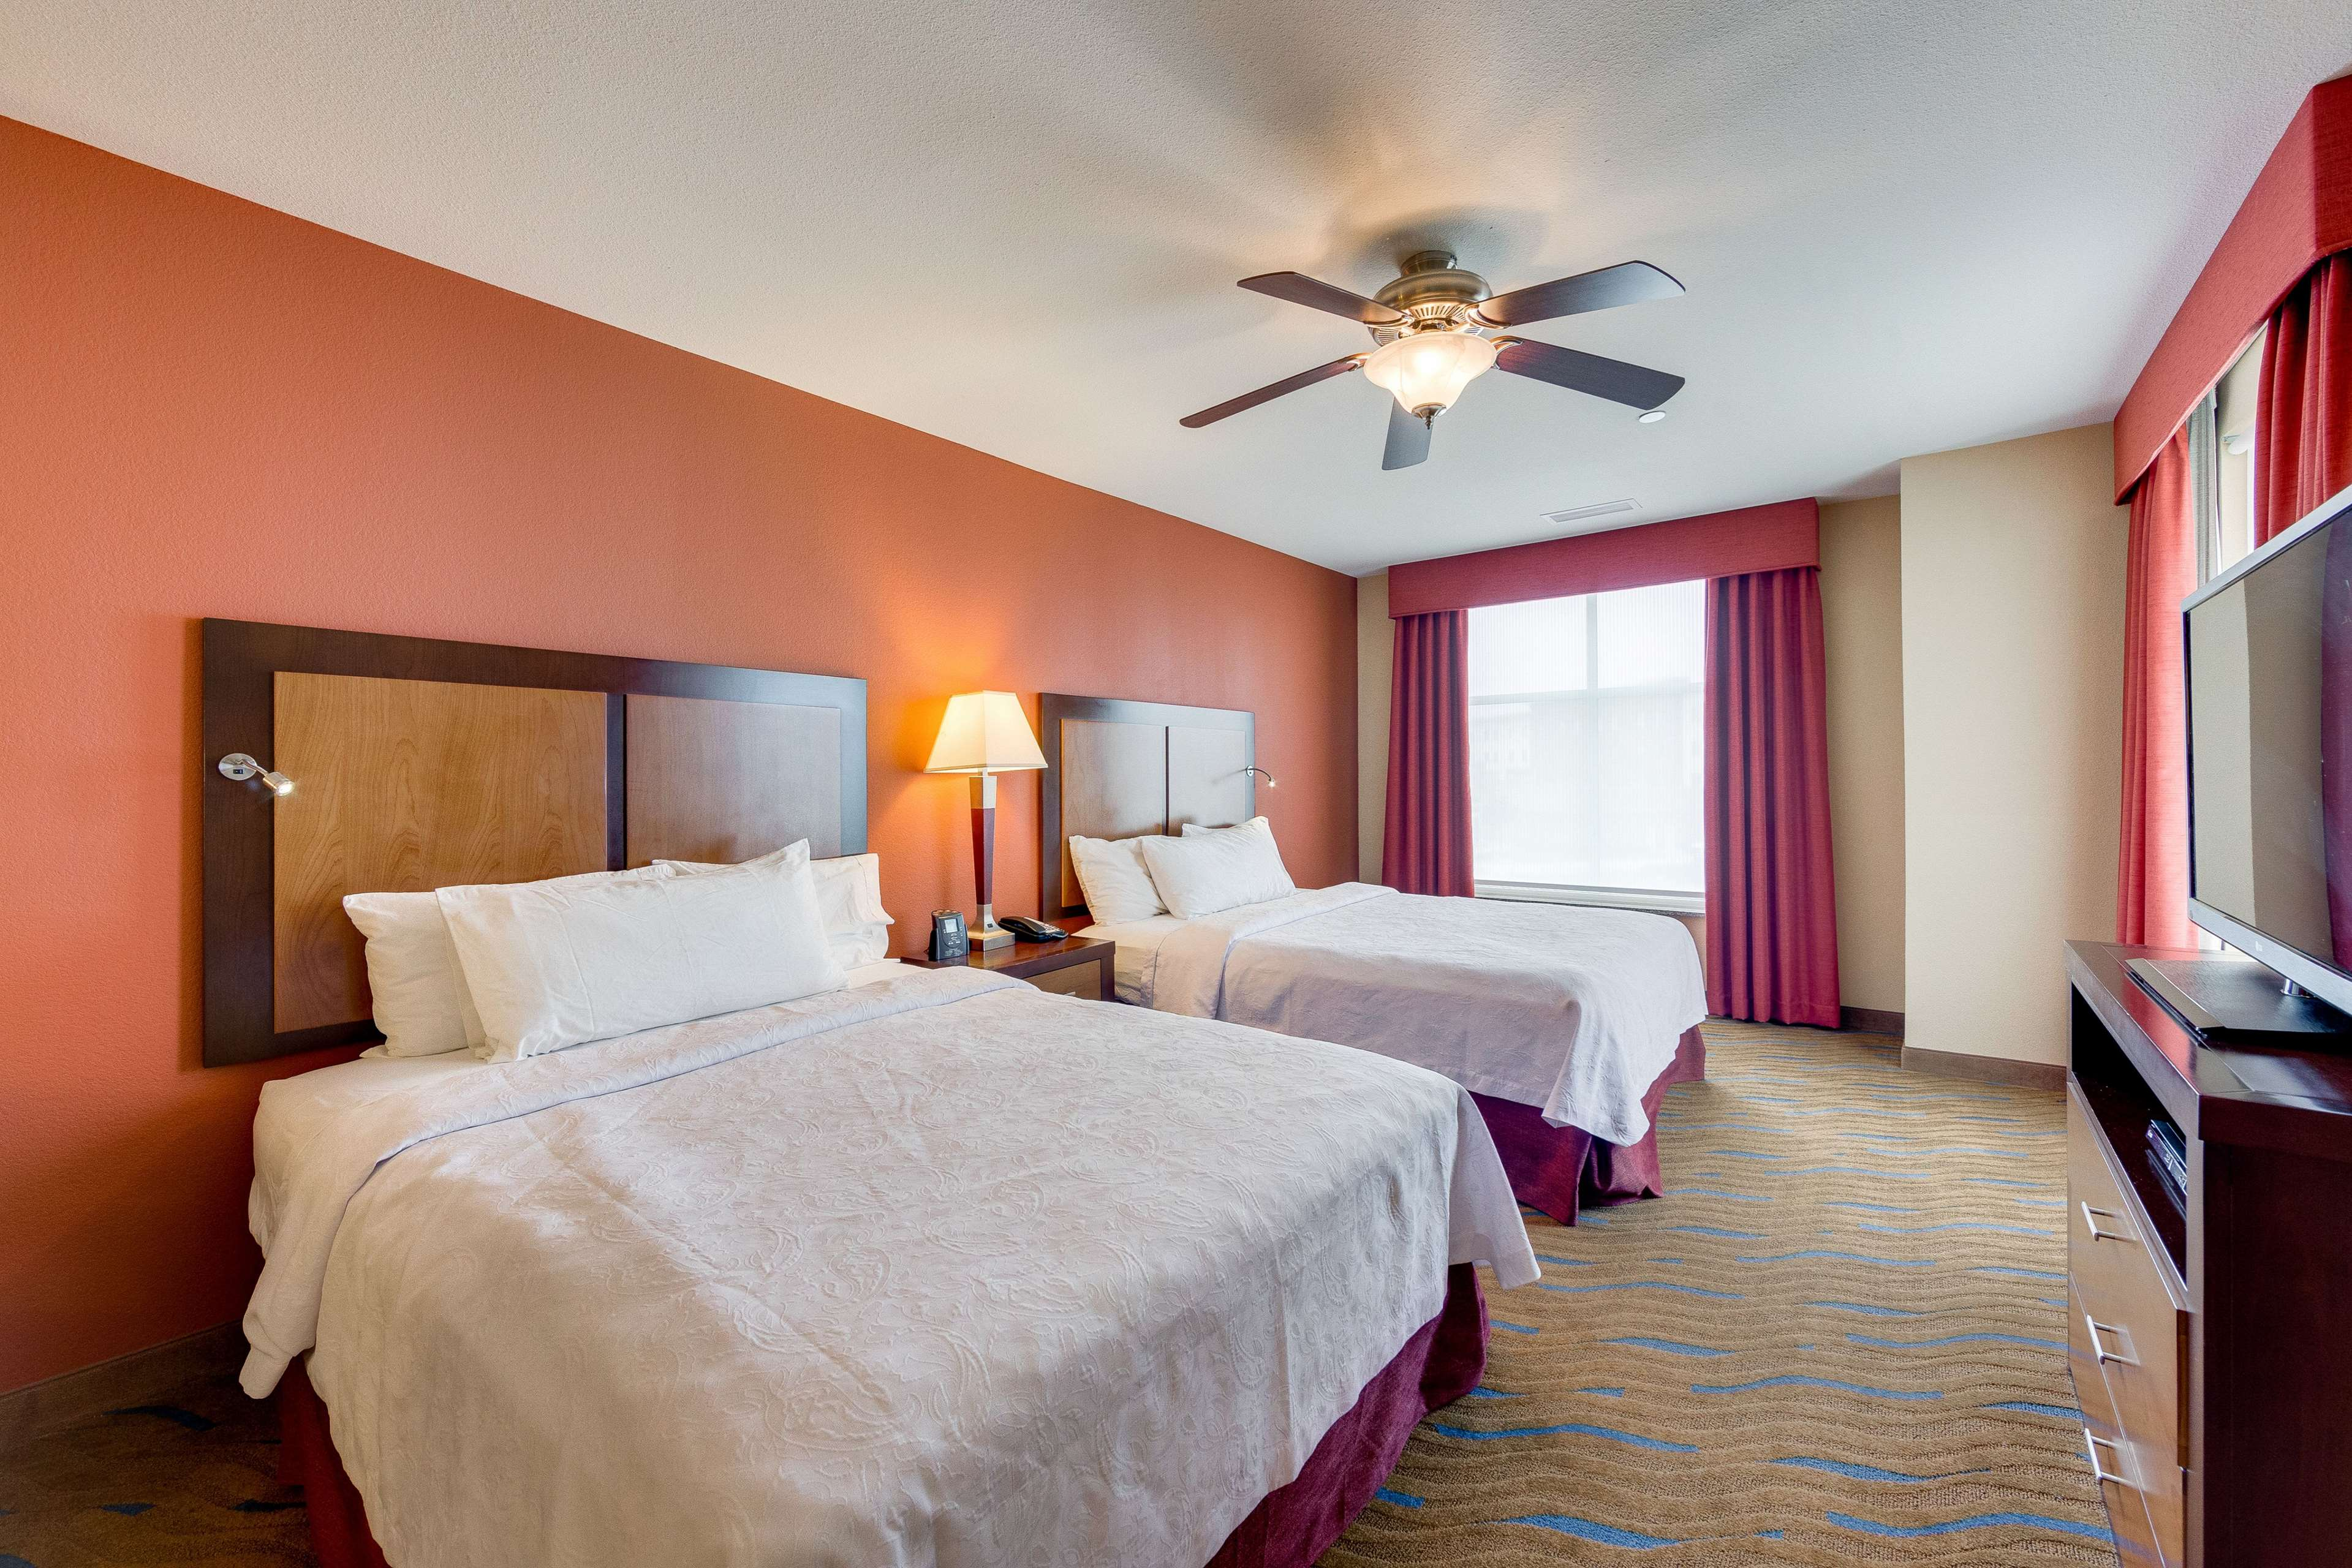 Homewood Suites by Hilton Fort Worth - Medical Center, TX image 23